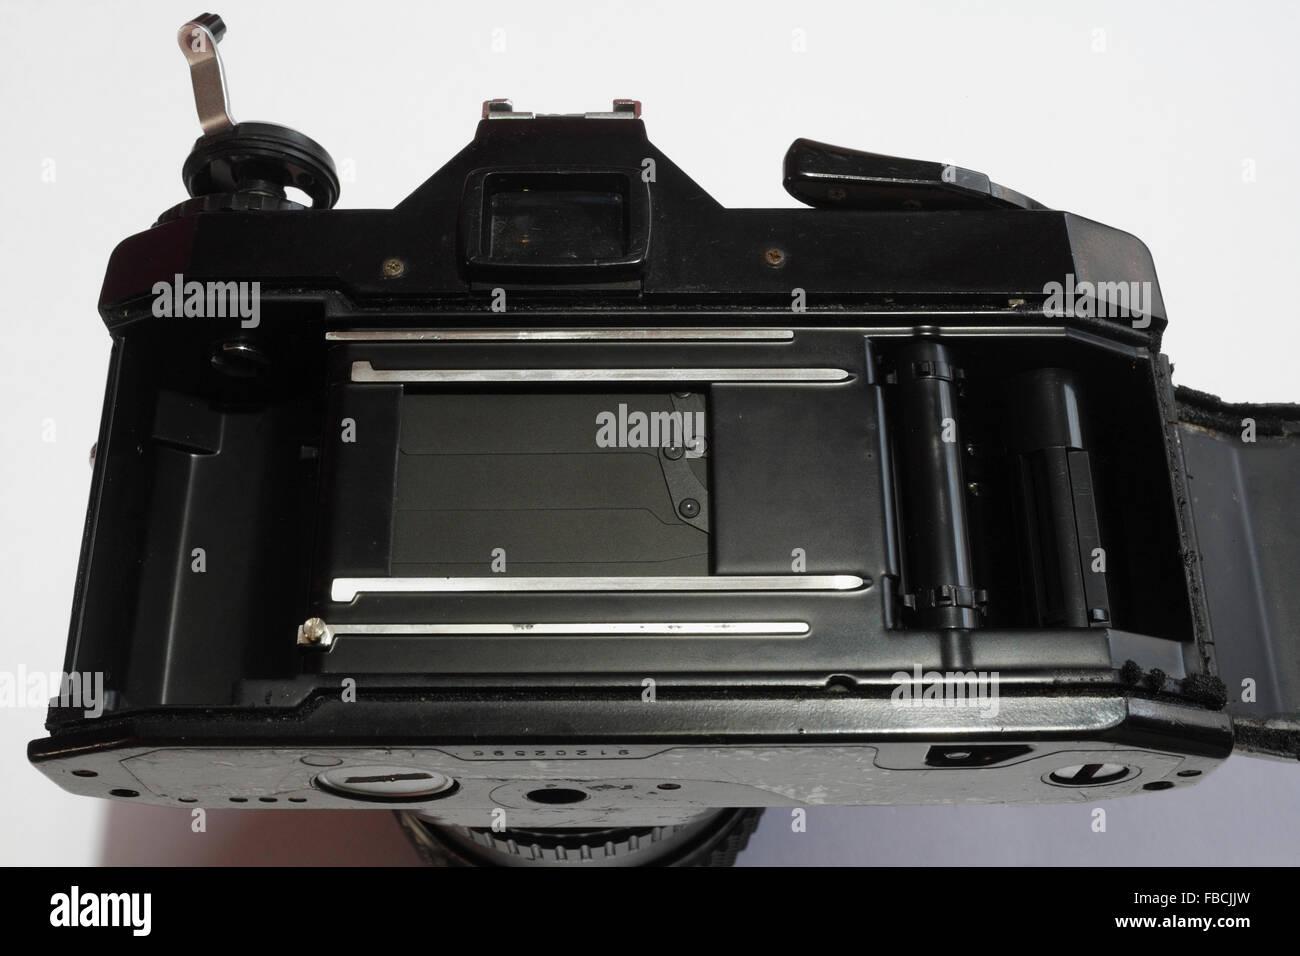 Film holder in a SLR camera - Stock Image